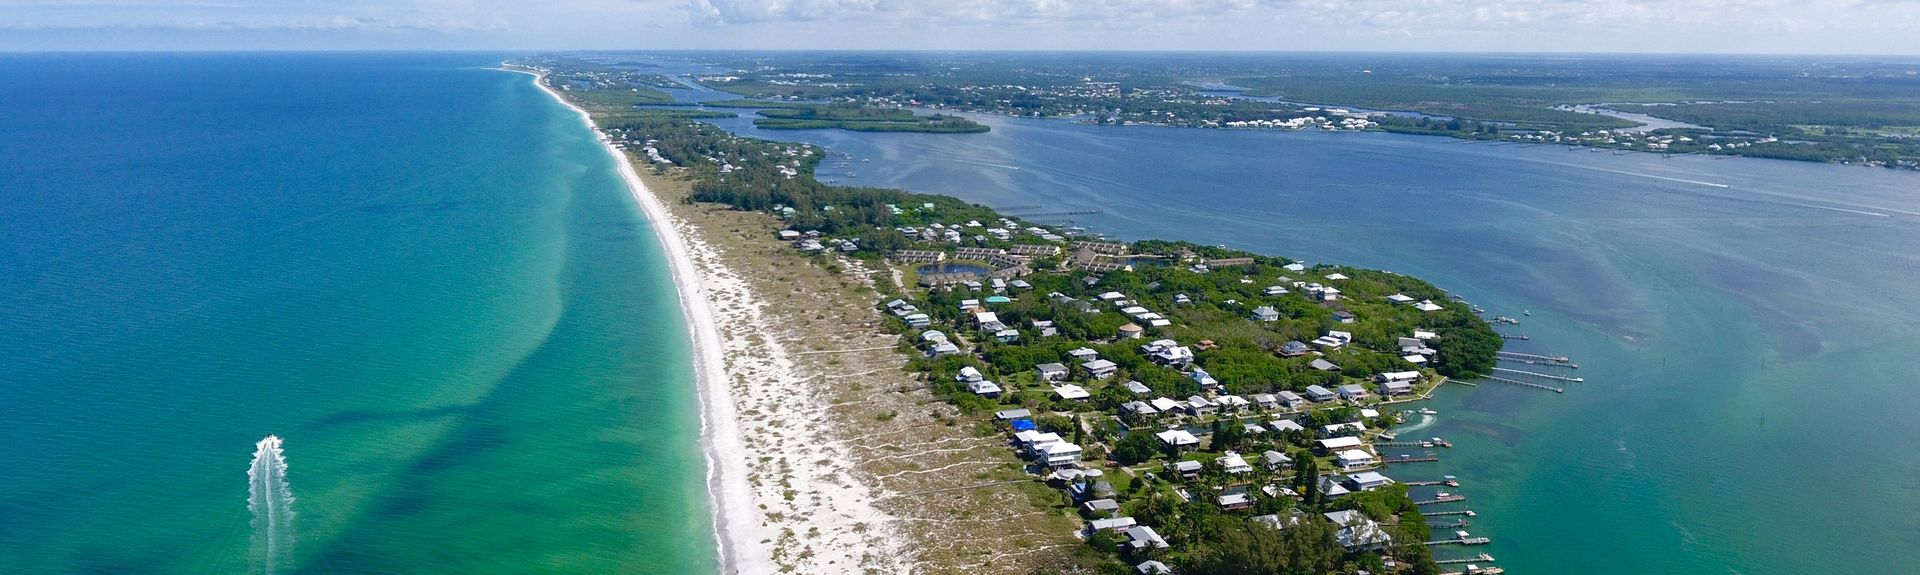 Port Charlotte Beach Park, Port Charlotte, Florida, United States of America